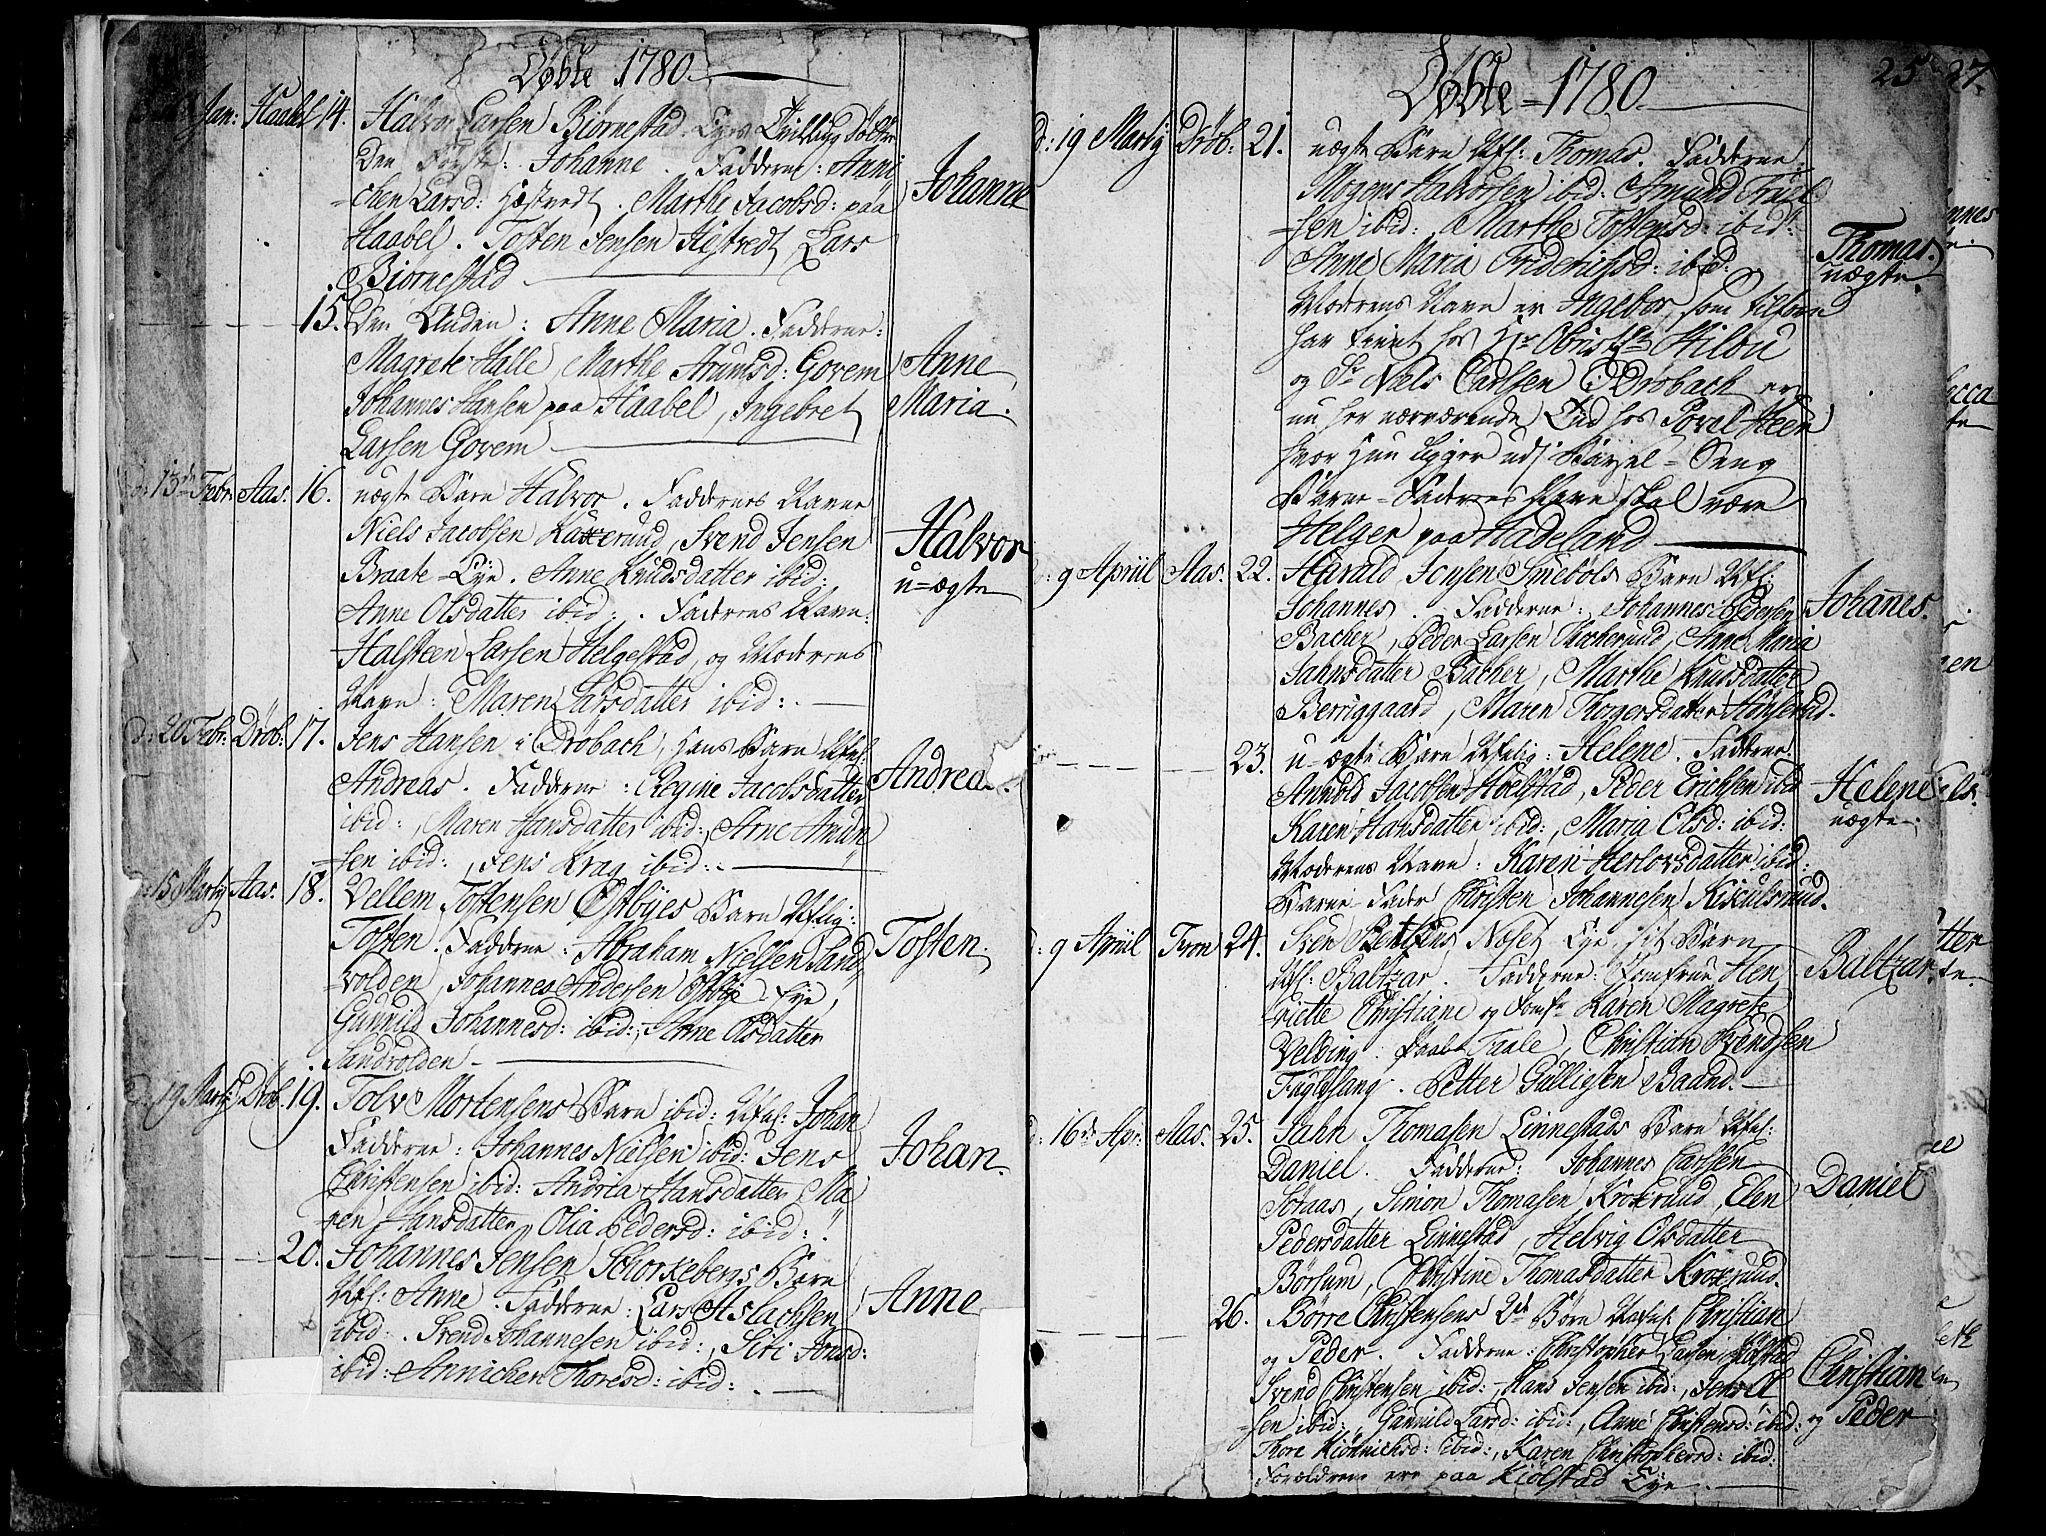 SAO, Ås prestekontor Kirkebøker, F/Fa/L0002: Ministerialbok nr. I 2, 1778-1813, s. 24-25